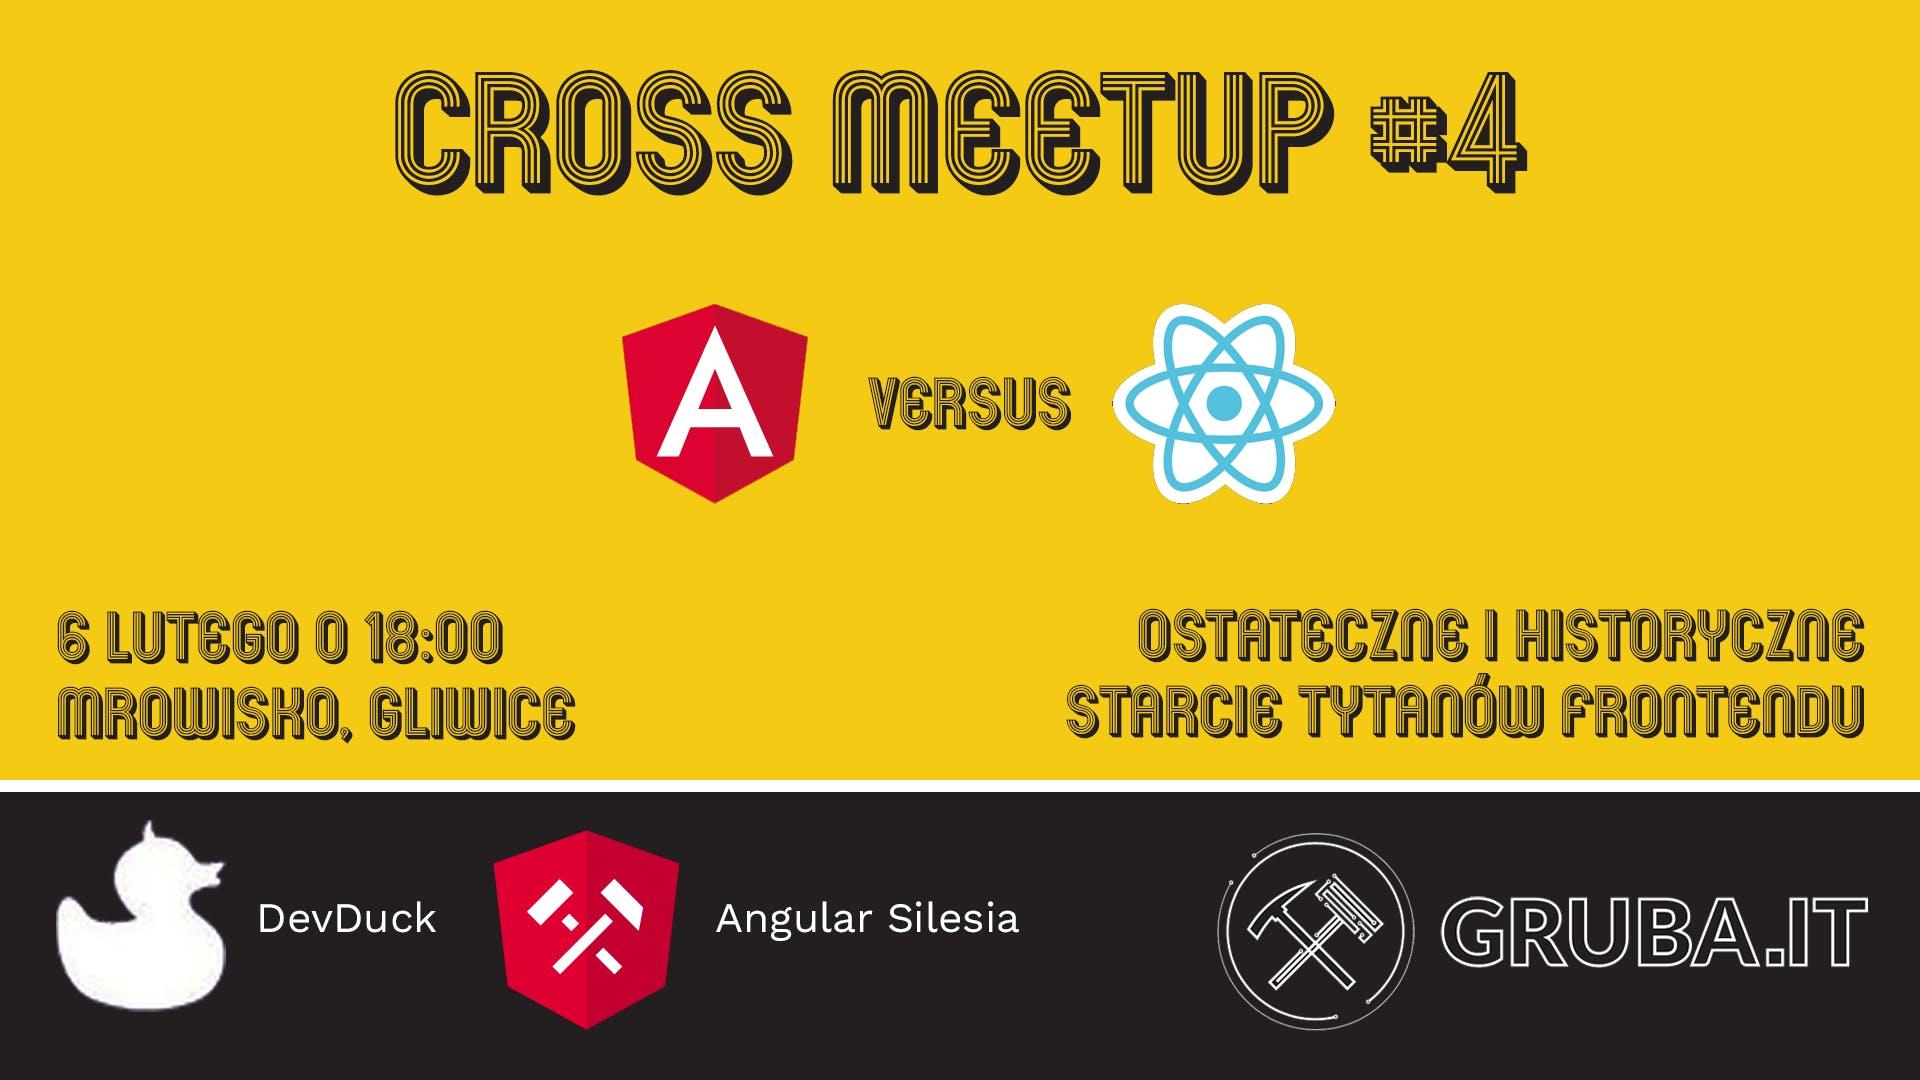 Cross Meetup] Angular vs React #4 - 6 FEB 2019